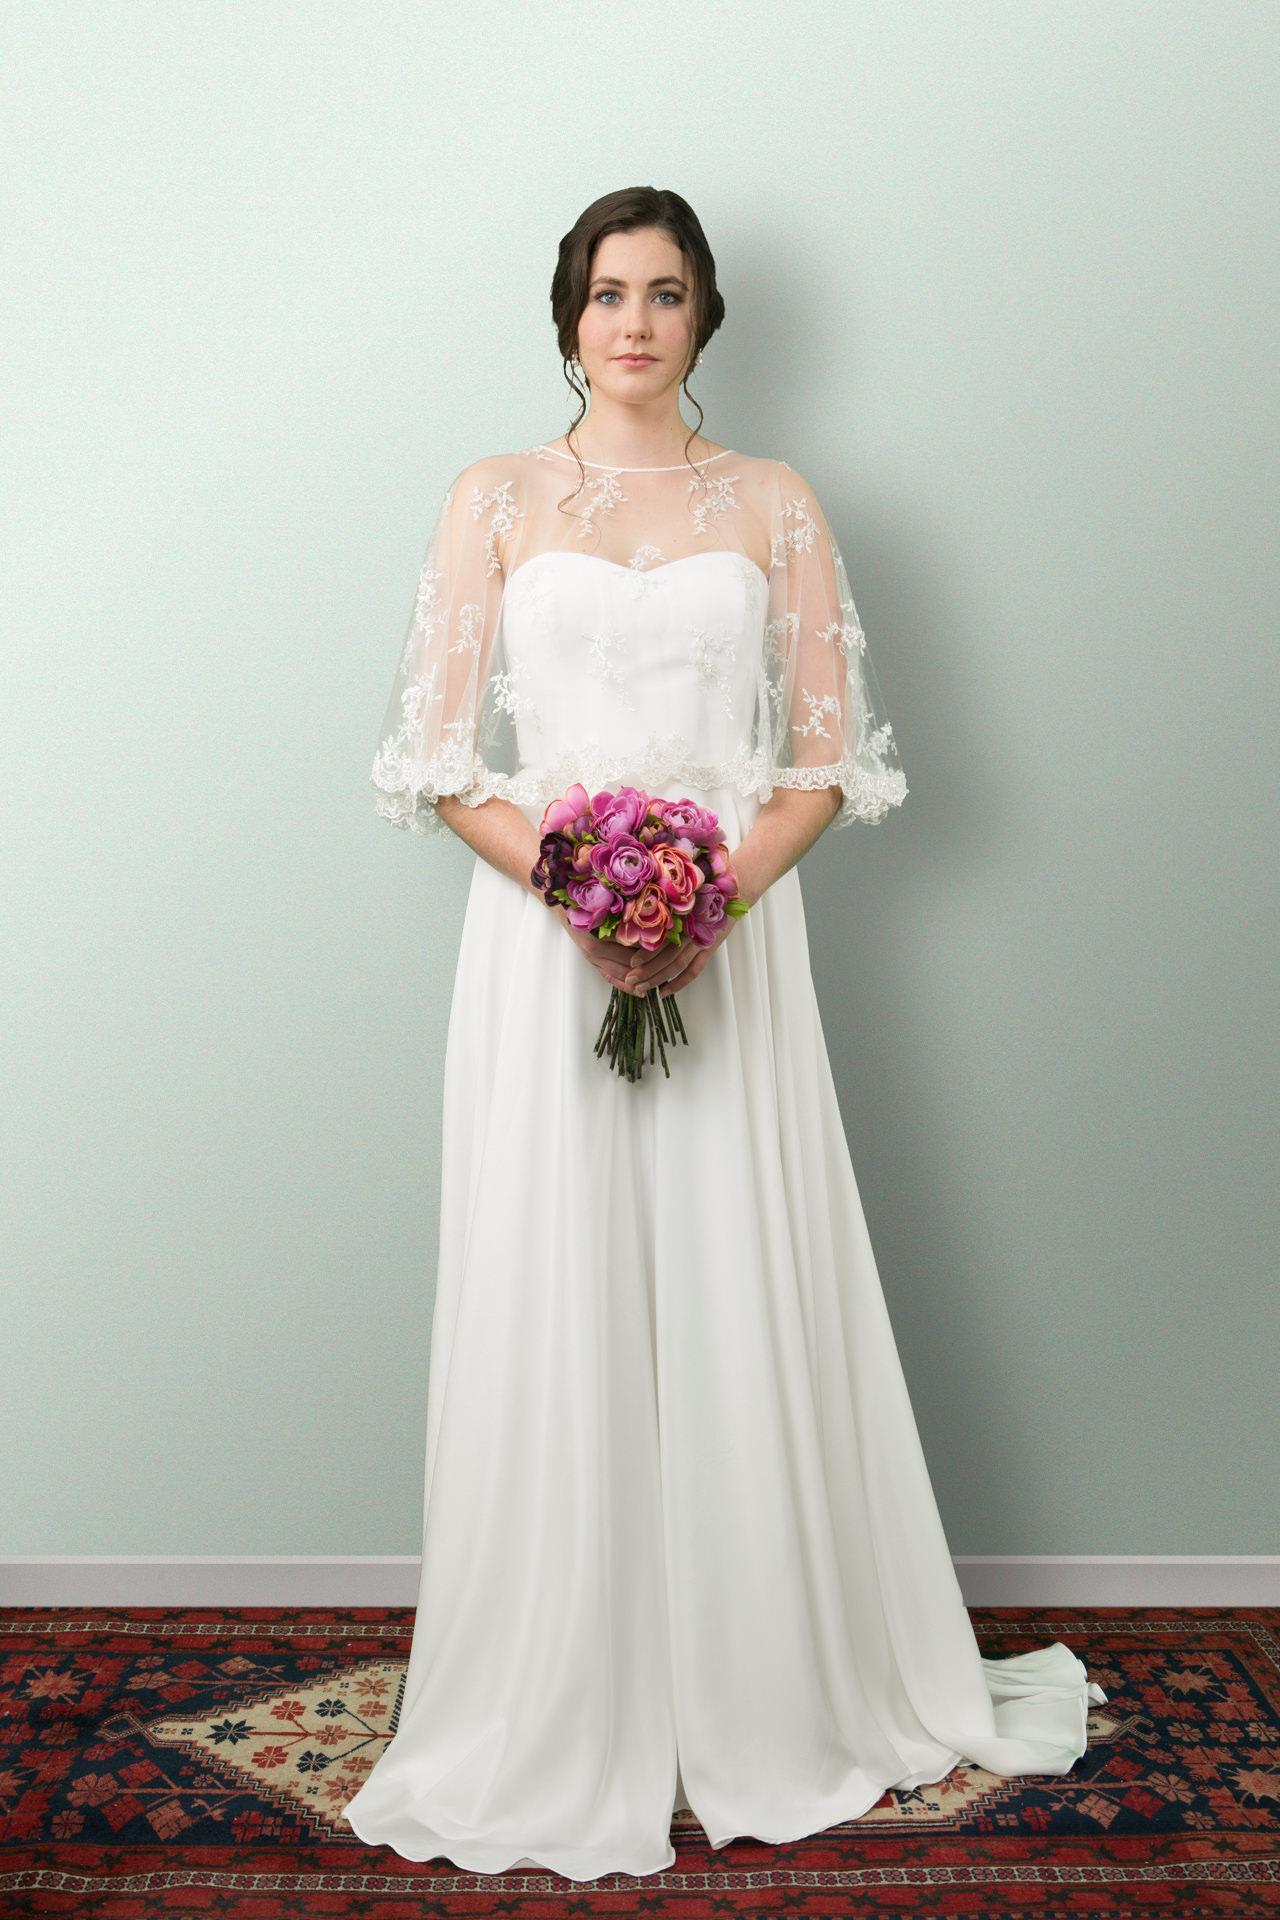 e29dc2e0ec3 Alana Lace wedding dress - PaperswanBride